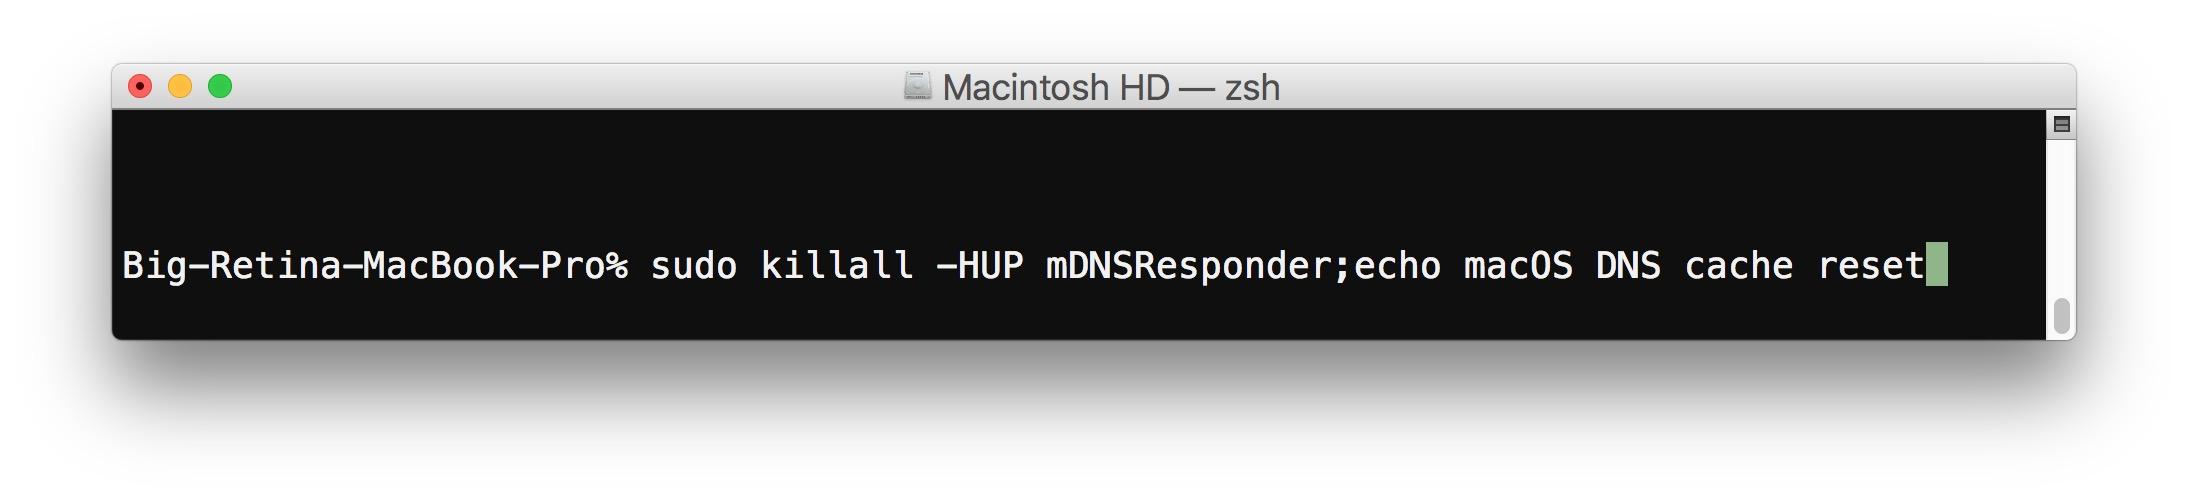 Reset DNS cache in macOS High Sierra